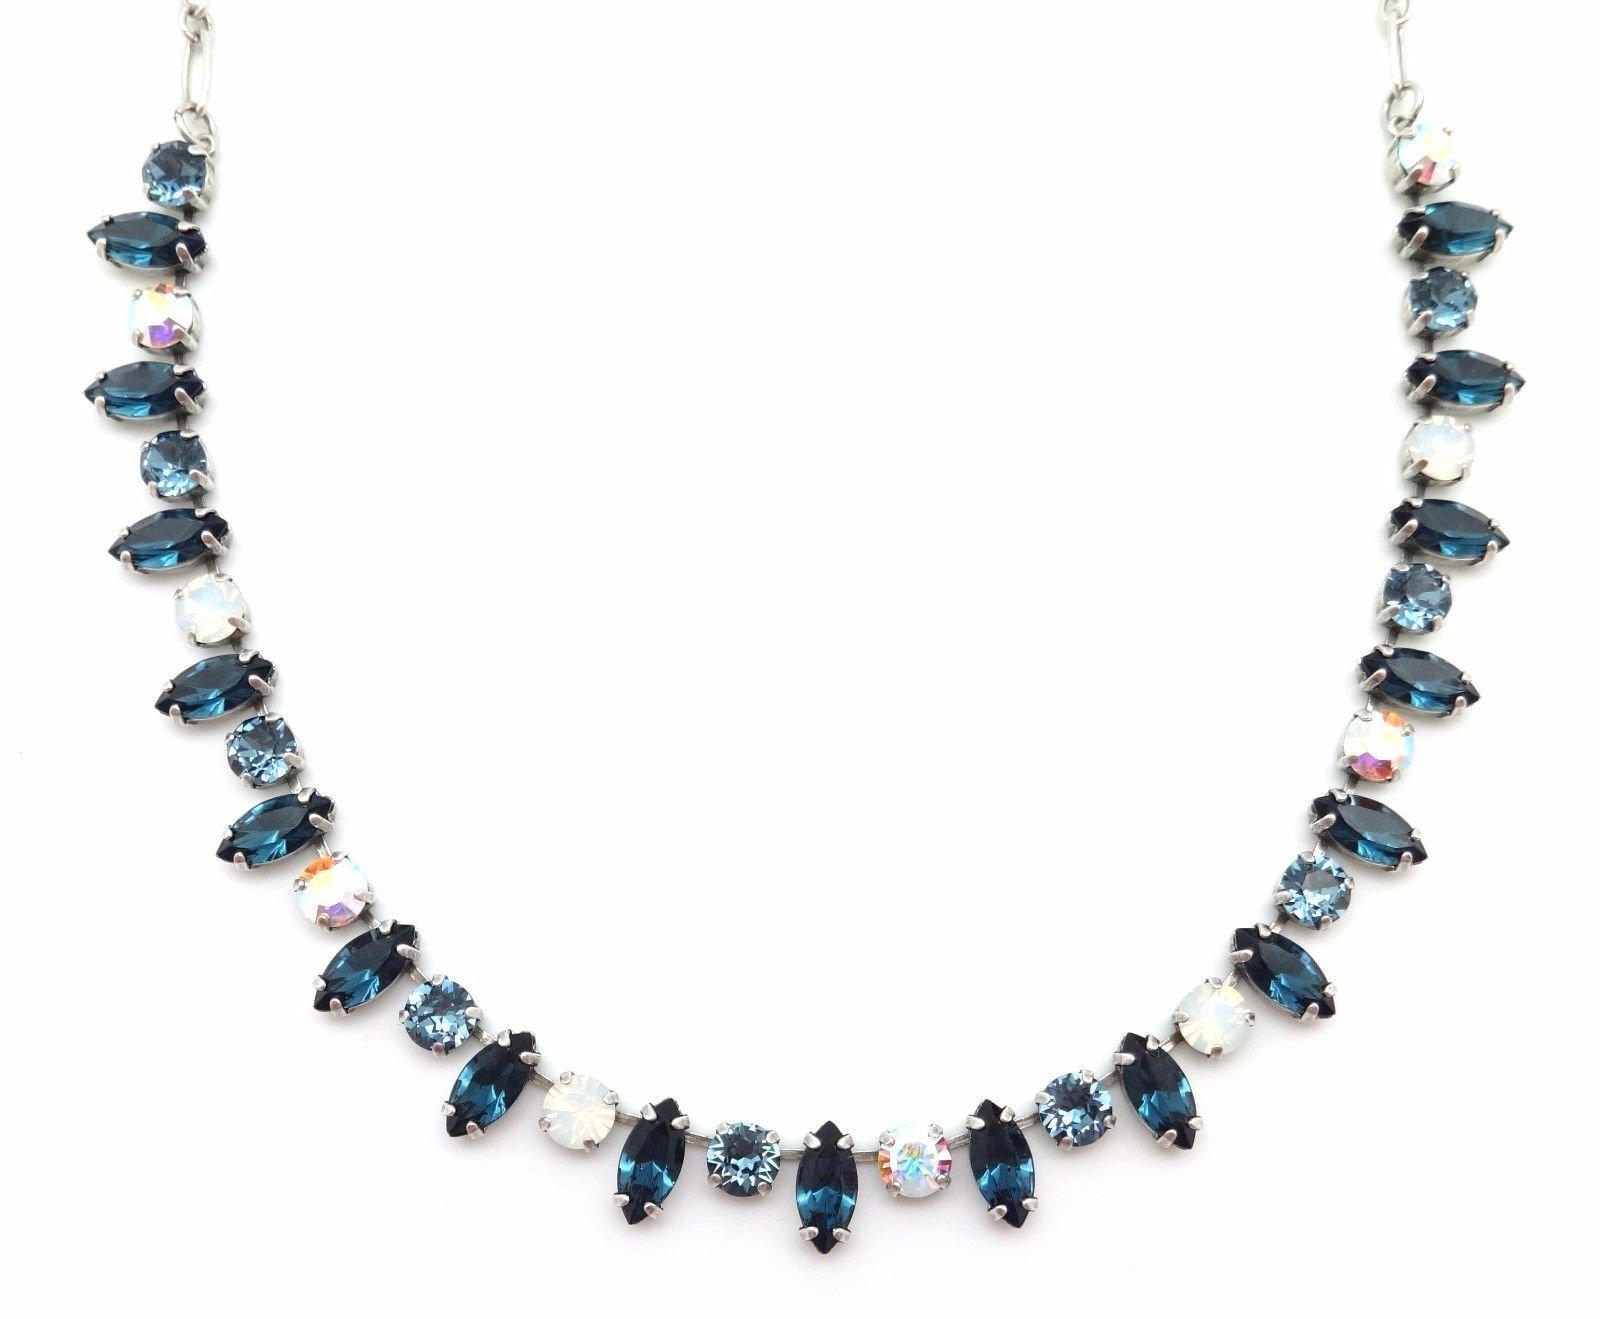 Mariana Silver Plated Swarovski Necklace Blue & White Marquise Round 1069 Mood Indigo